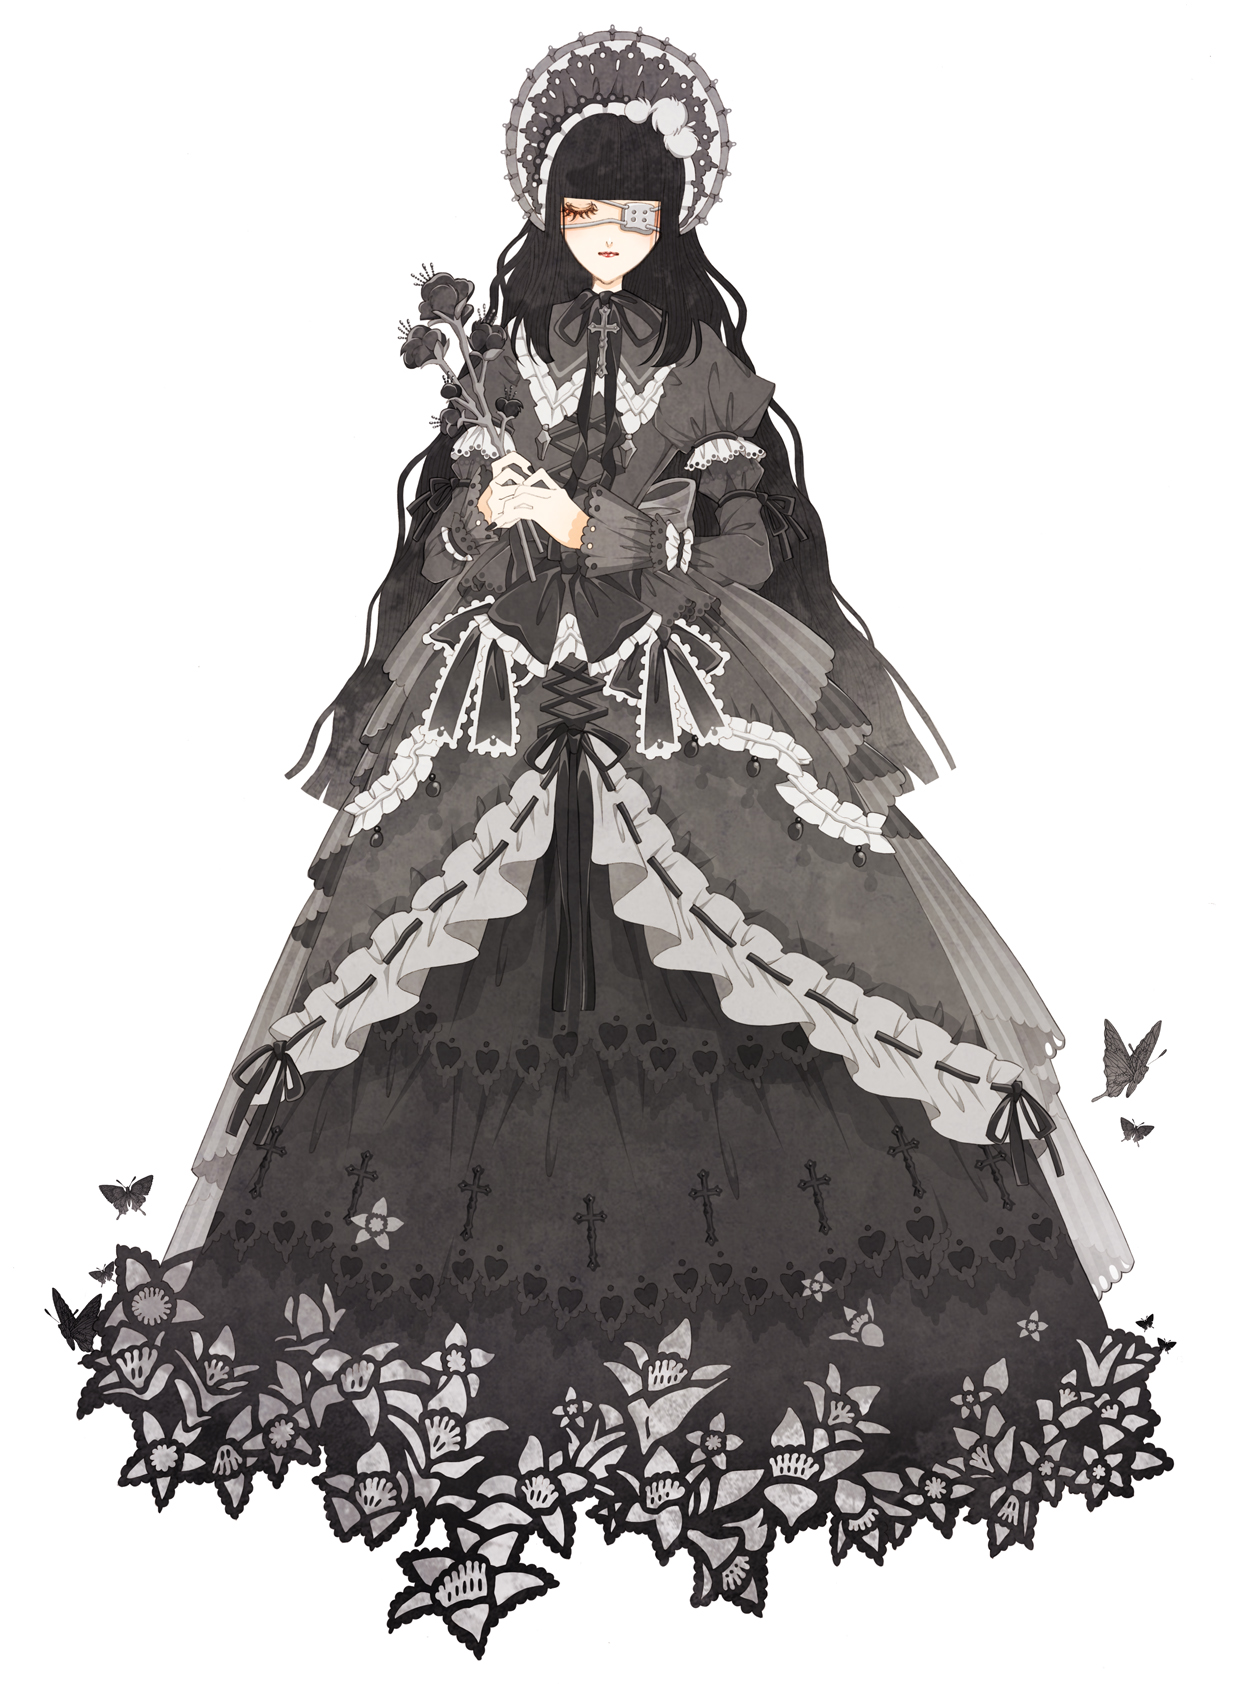 Victorian Clothes, Female, Solo  page 10 - Zerochan Anime Image Board